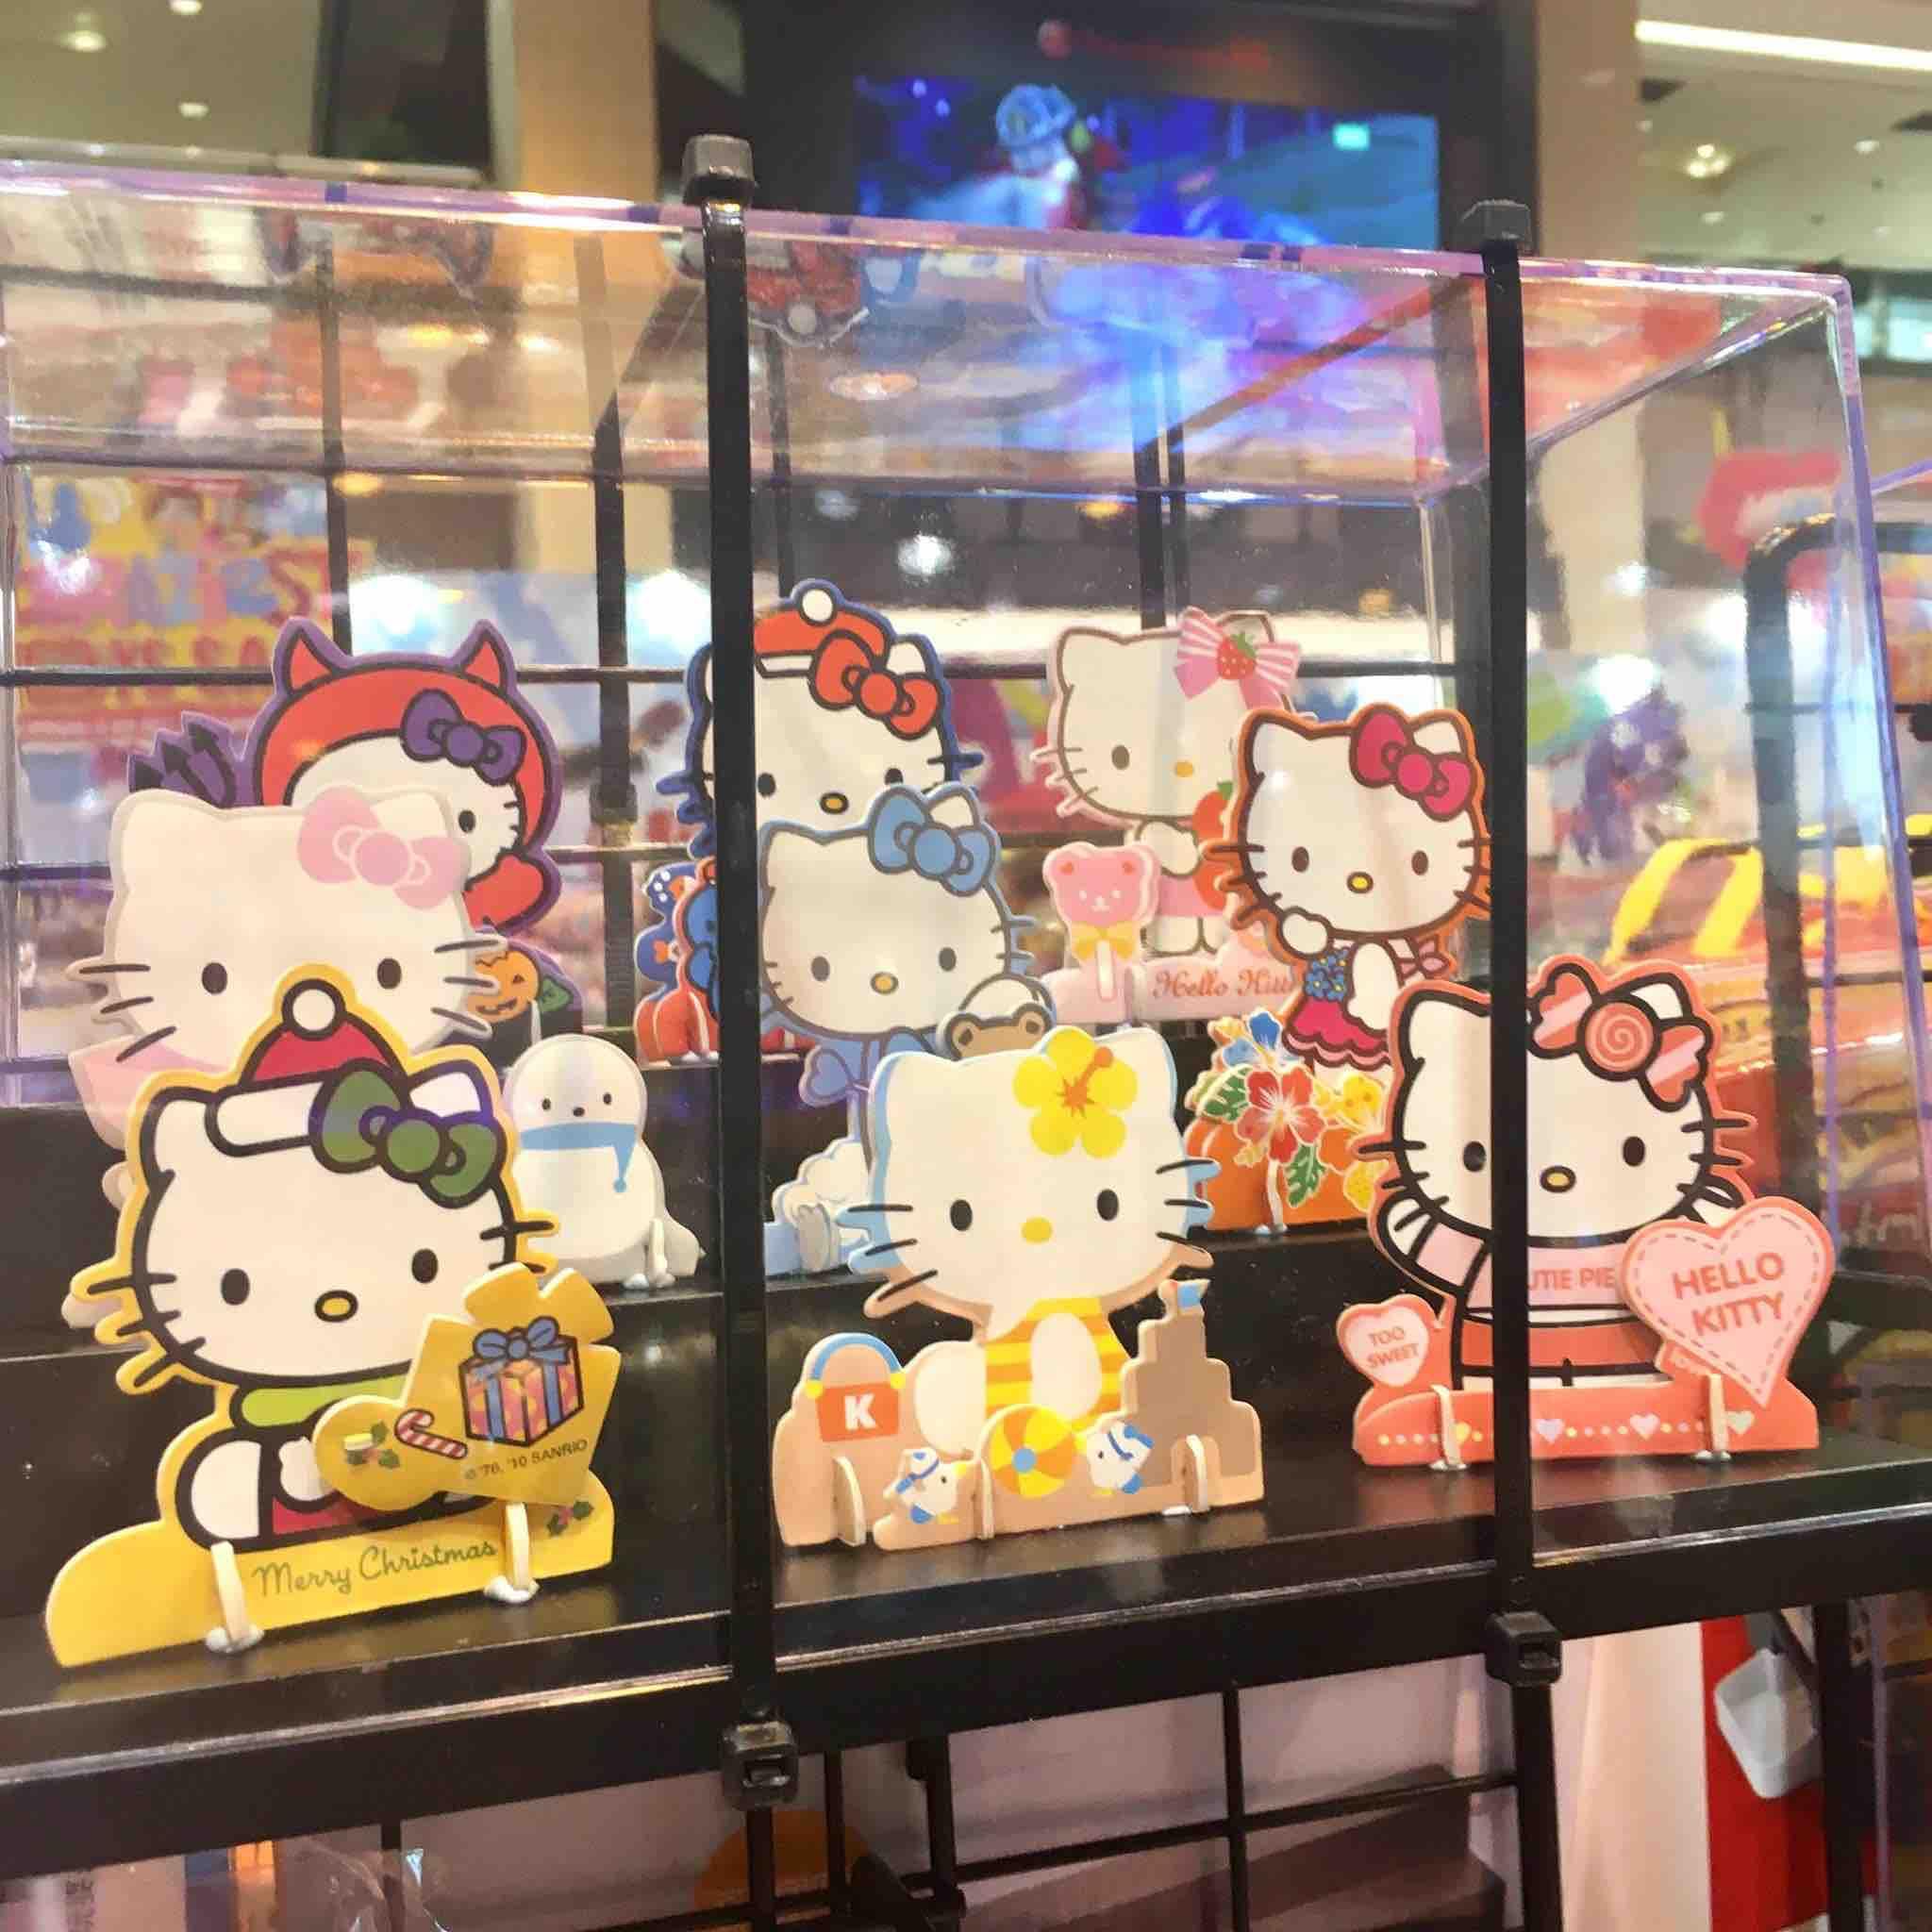 Takashimaya Singapore 21st Craziest Toys Sale Promotion 28 Jul - 6 Aug 2017   Why Not Deals 4 & Promotions